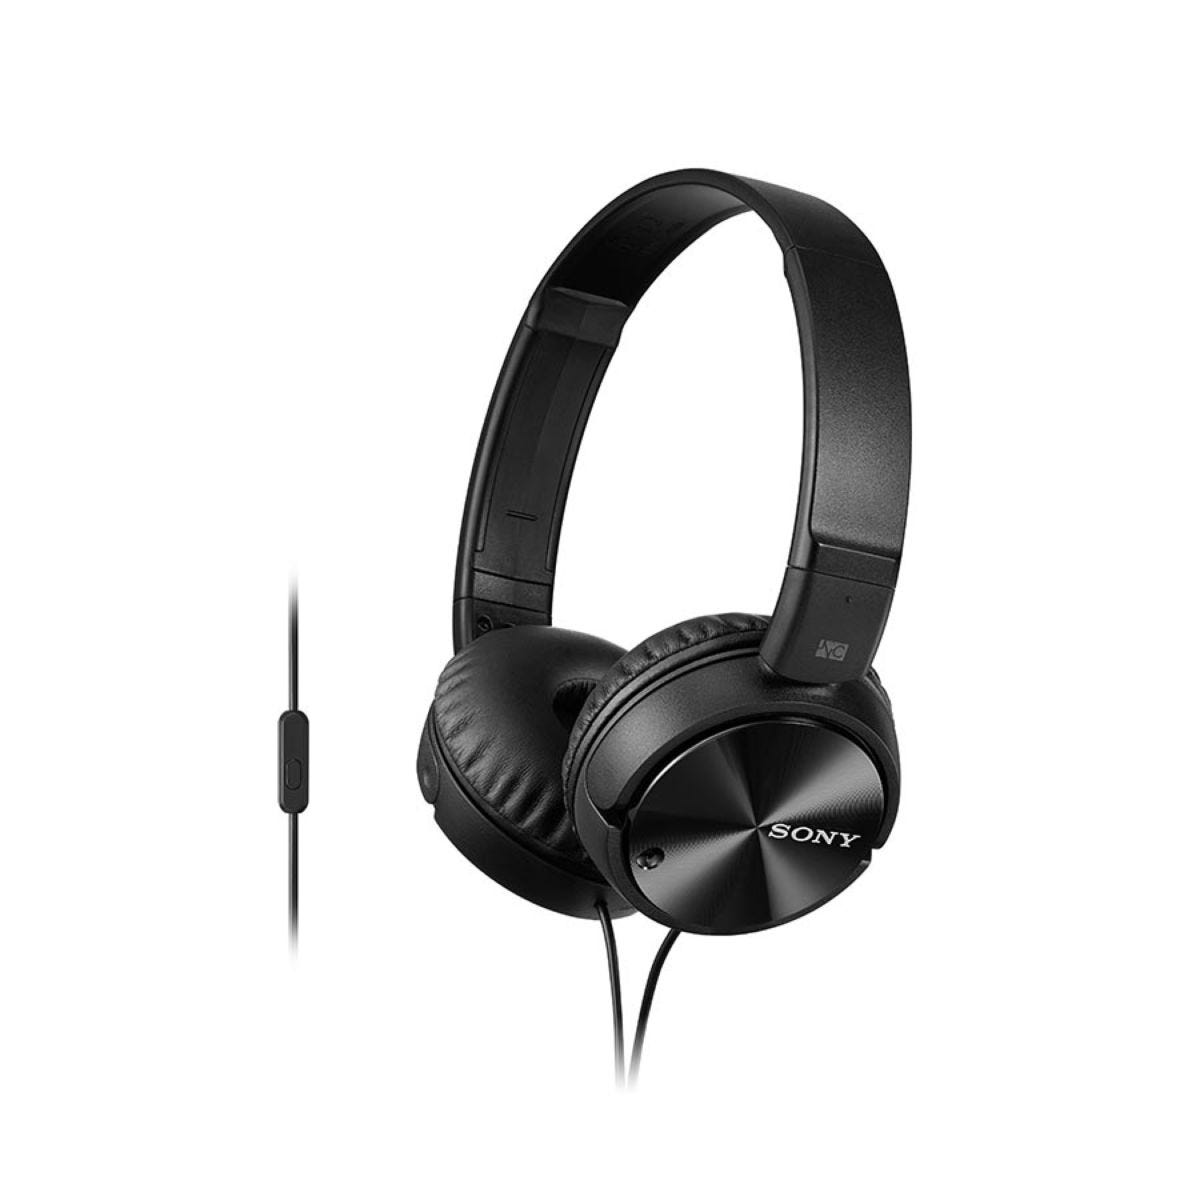 Sony Noise-Cancelling Headphones - Black